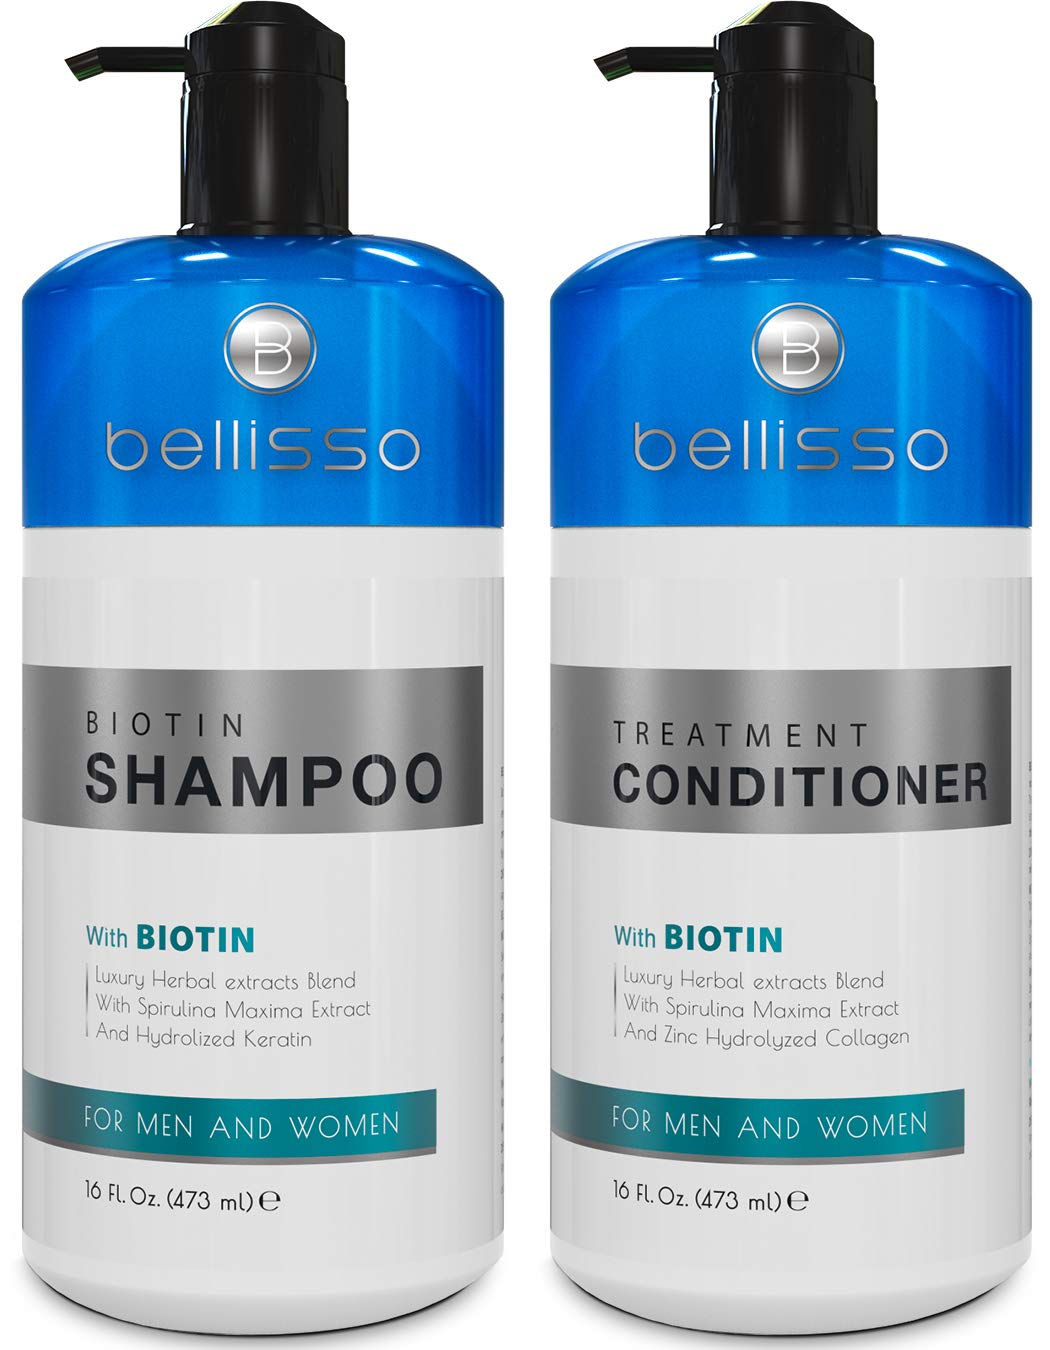 Best Hair Regrowth Treatments For Men & Women (Buying Guide) - Bellisso